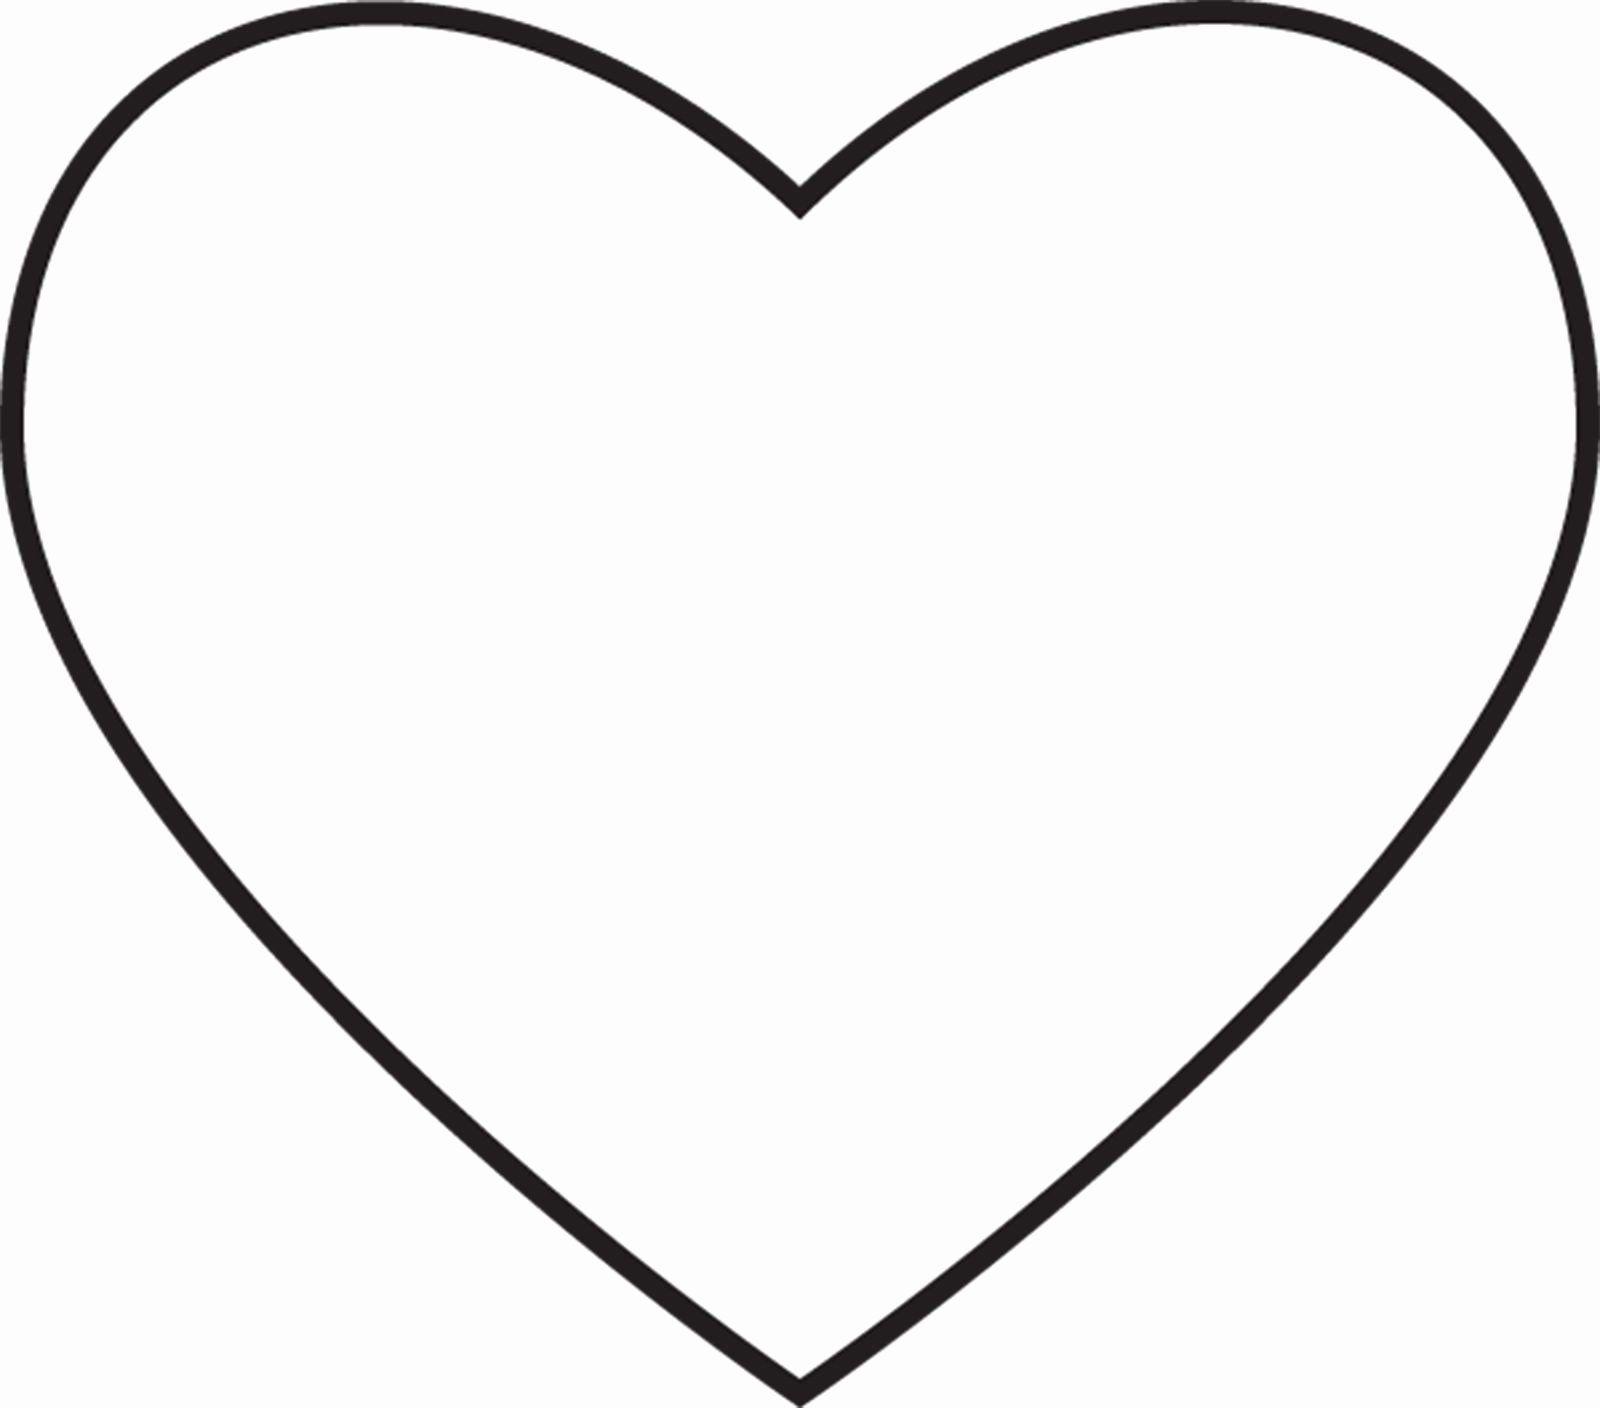 Heart Shape Coloring Page Elegant Heart Shape Coloring